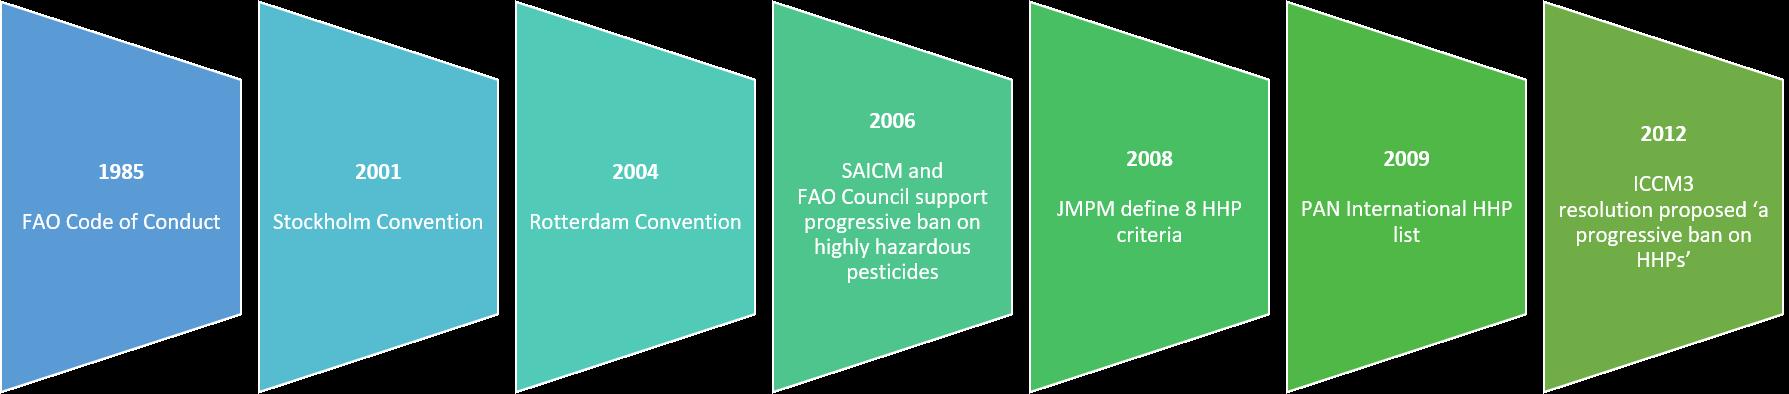 Global governance timeline on highly hazardous pesticides